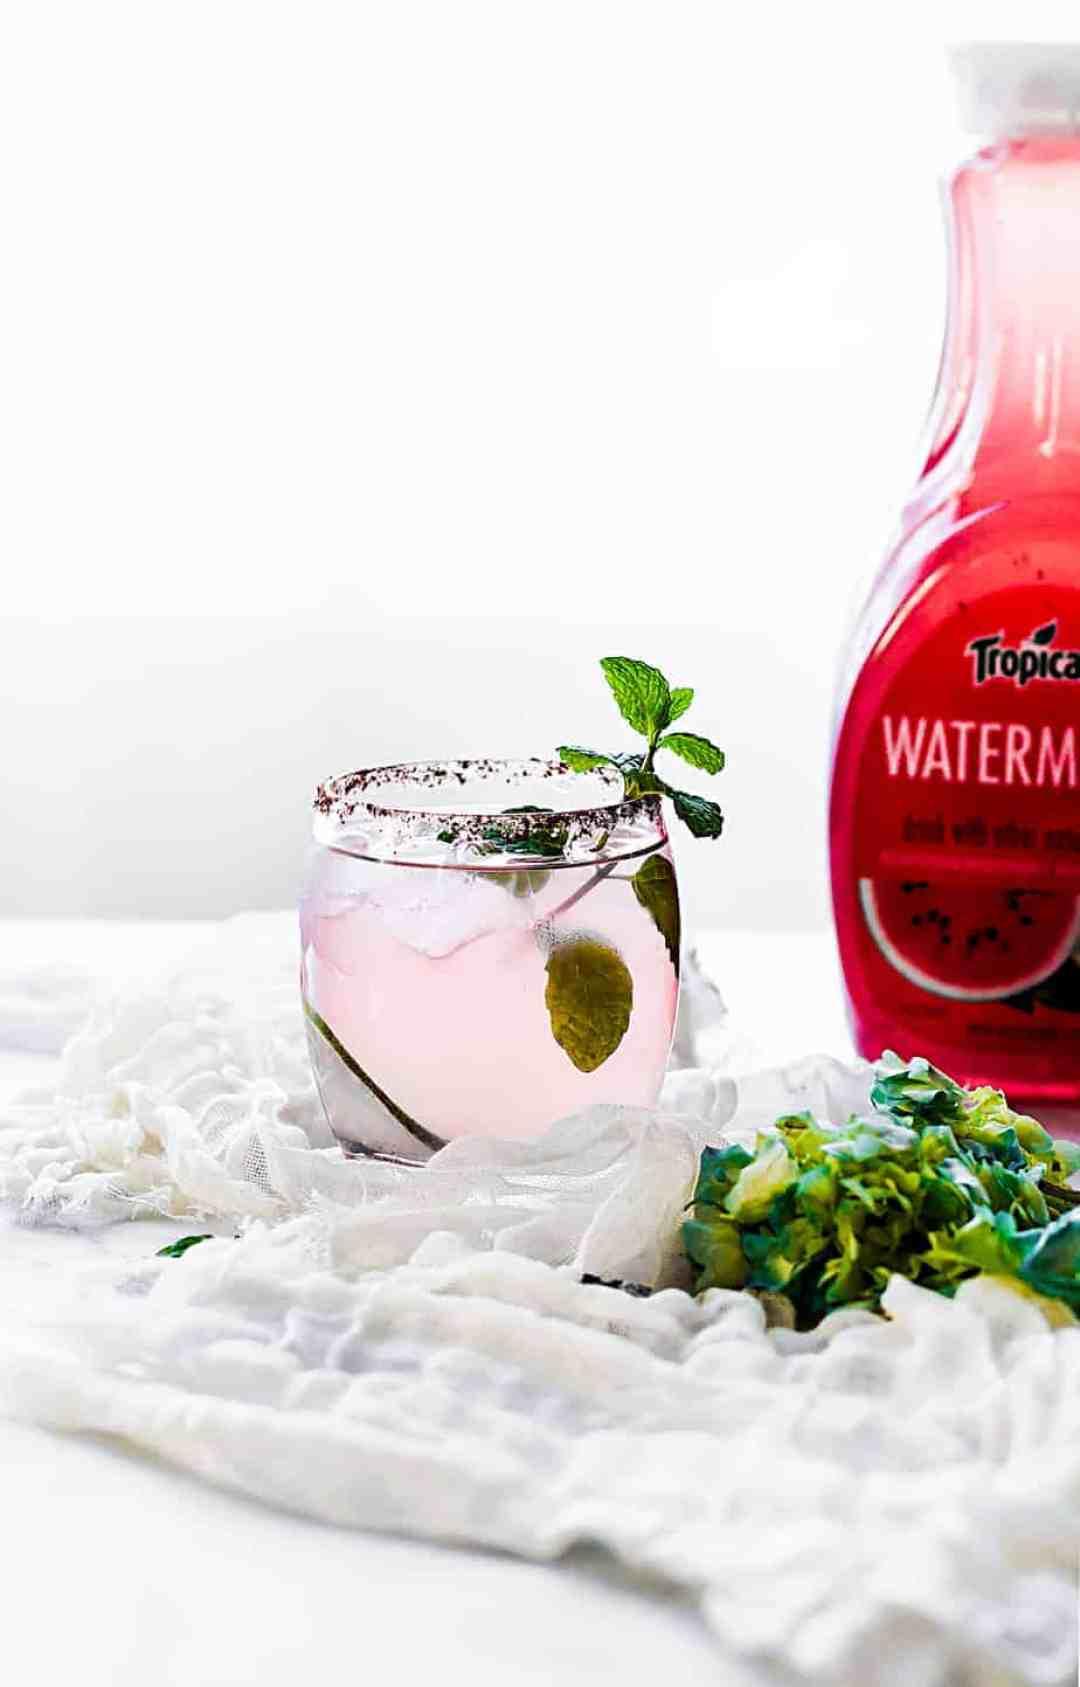 kickin' watermelon margarita with Tropicana Watermelon juice